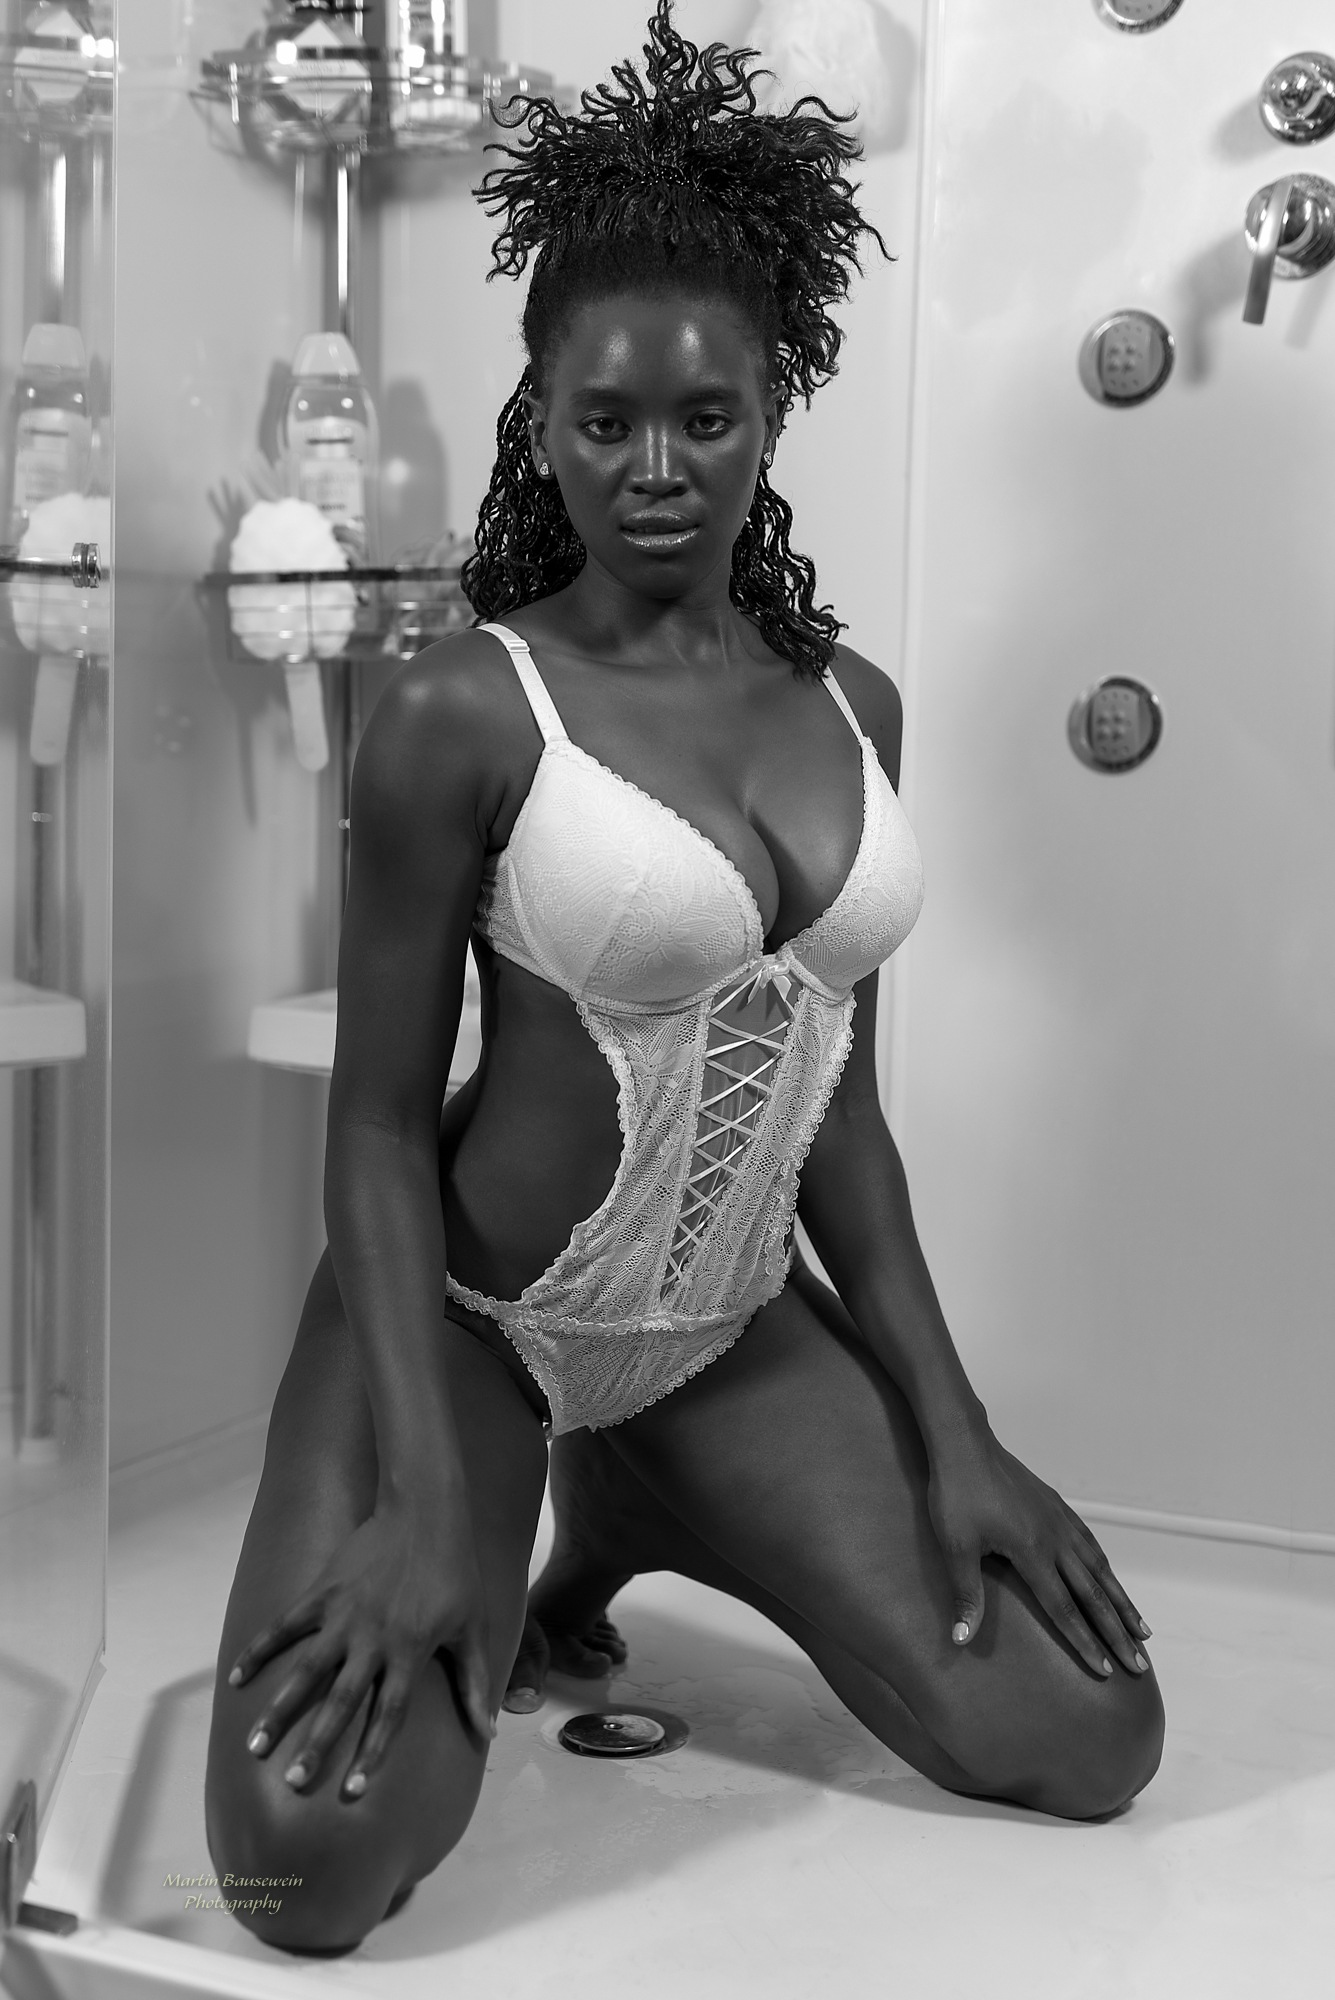 black 'n white by Martin Bausewein